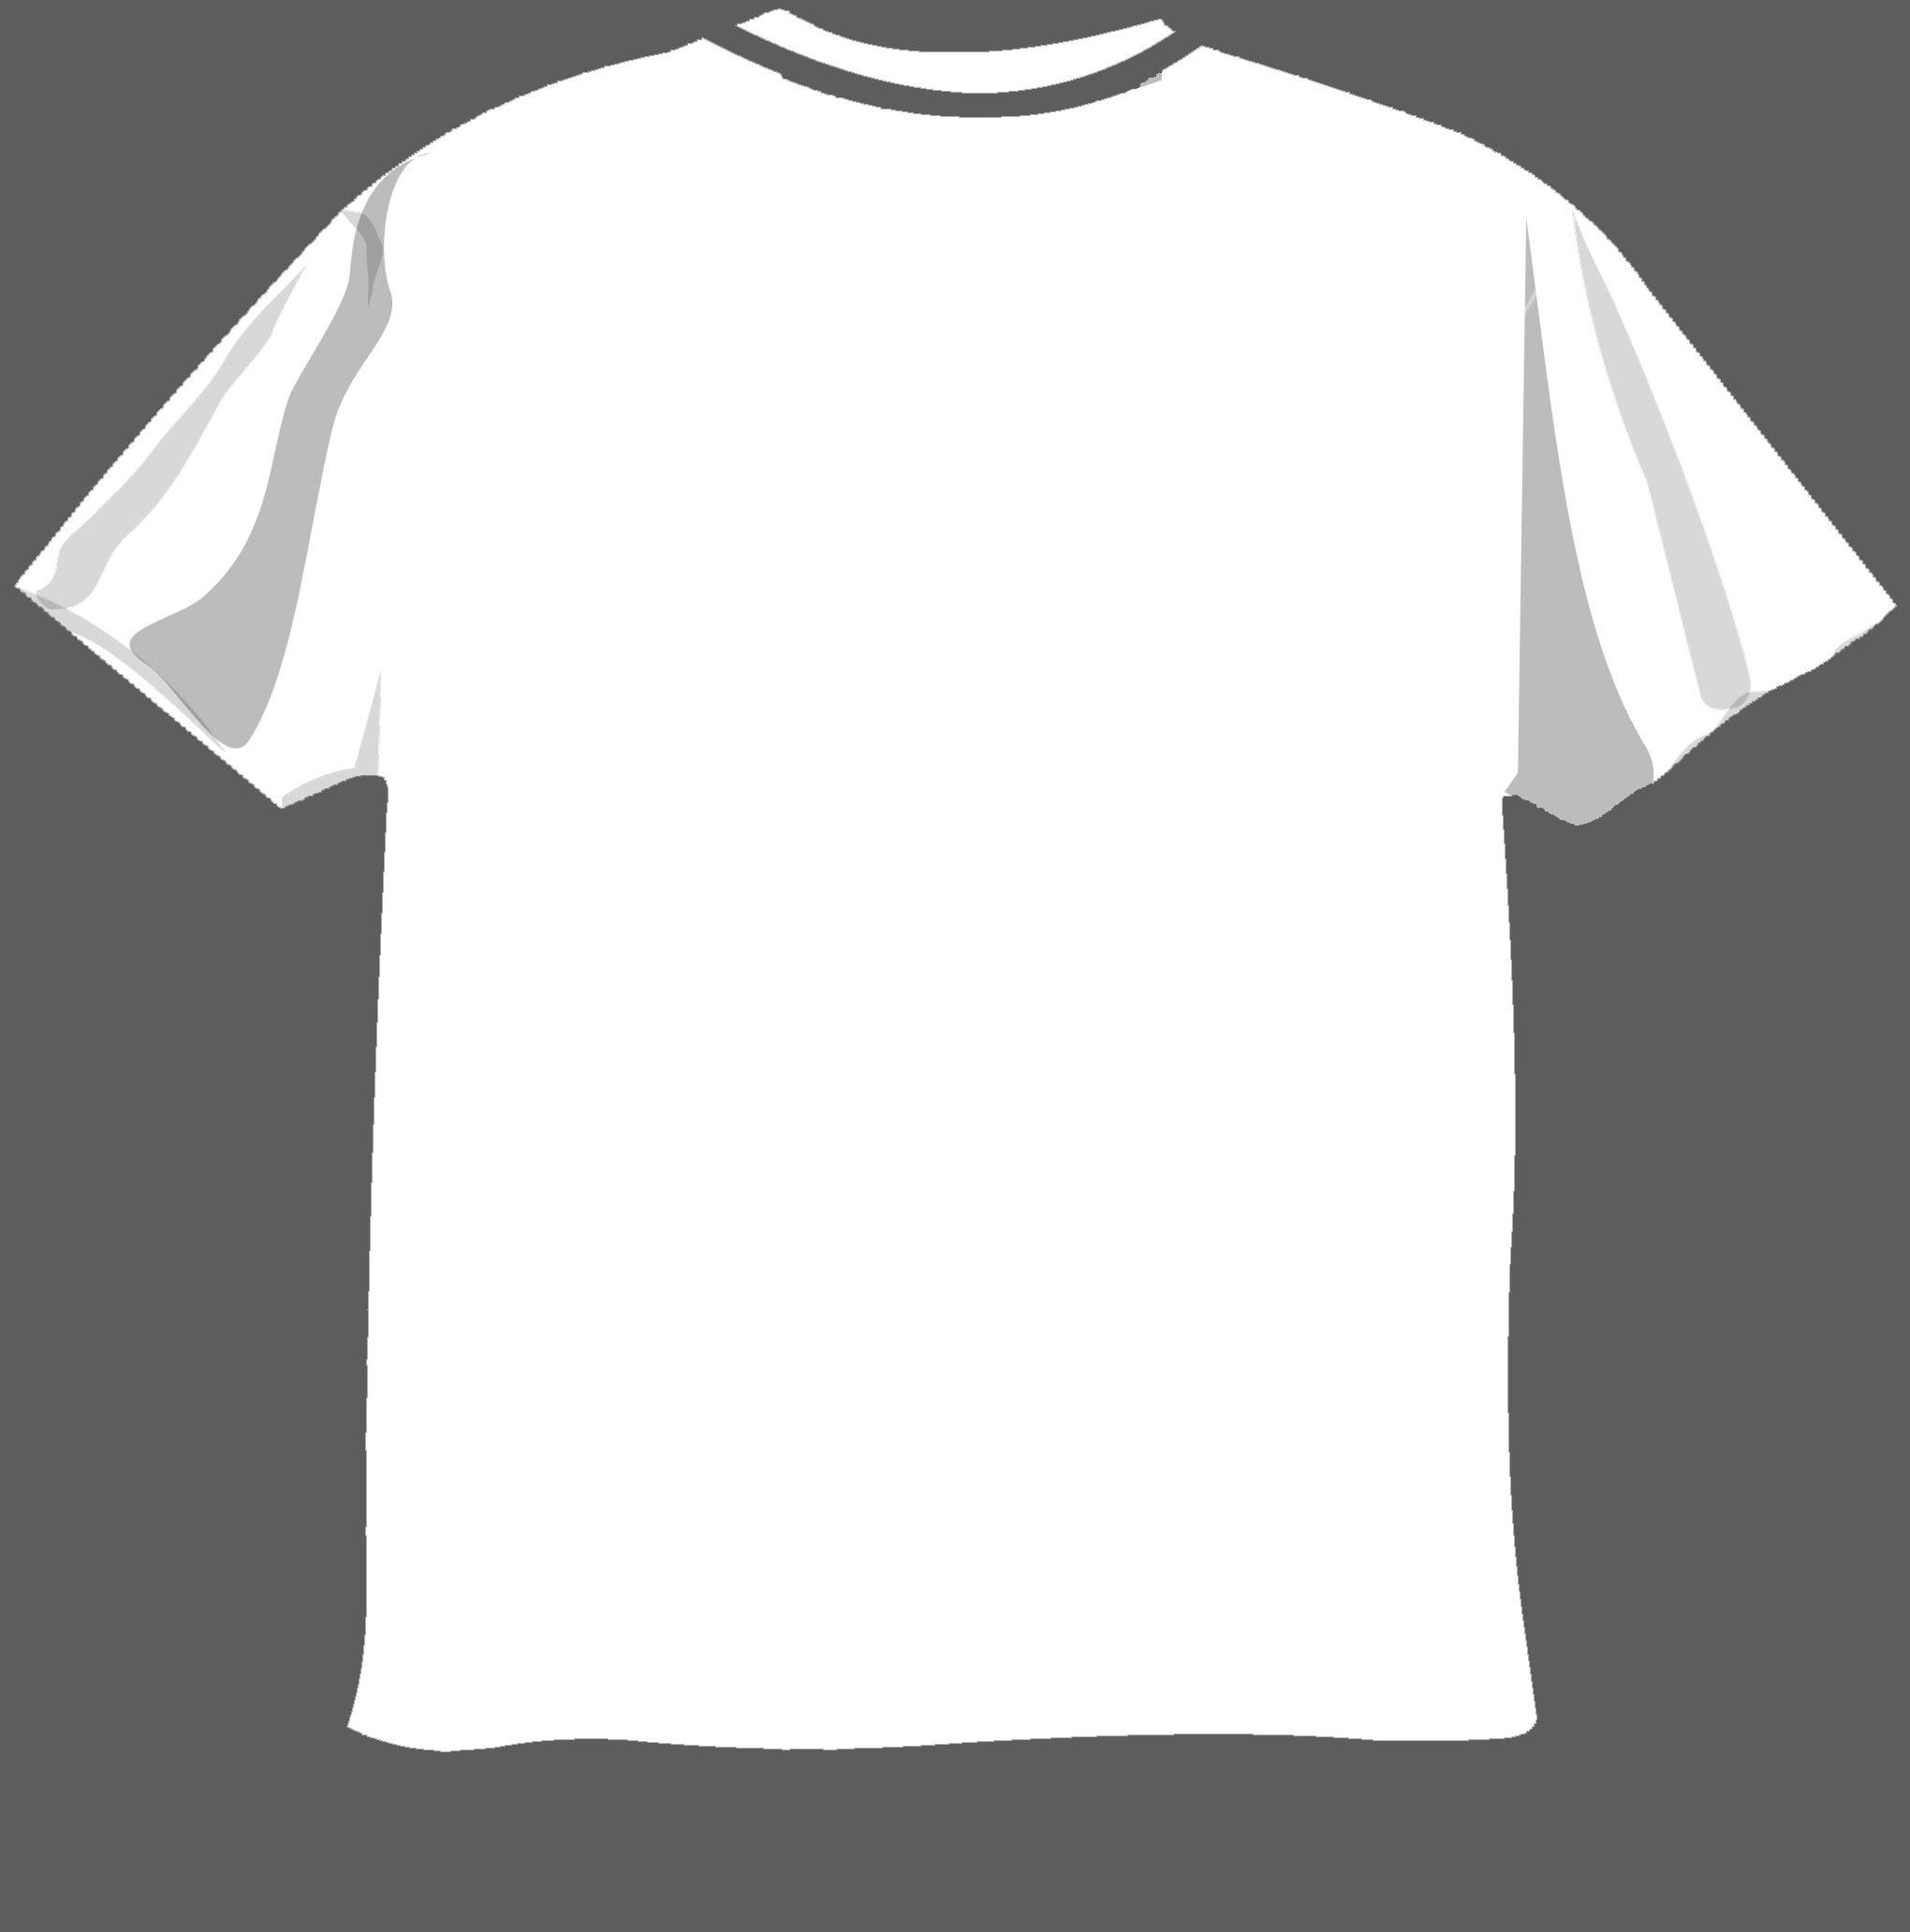 Design t shirt in photoshop - Photoshop Design T Shirt Download Black T Shirt Design Template Photoshop Black T Shirt Design